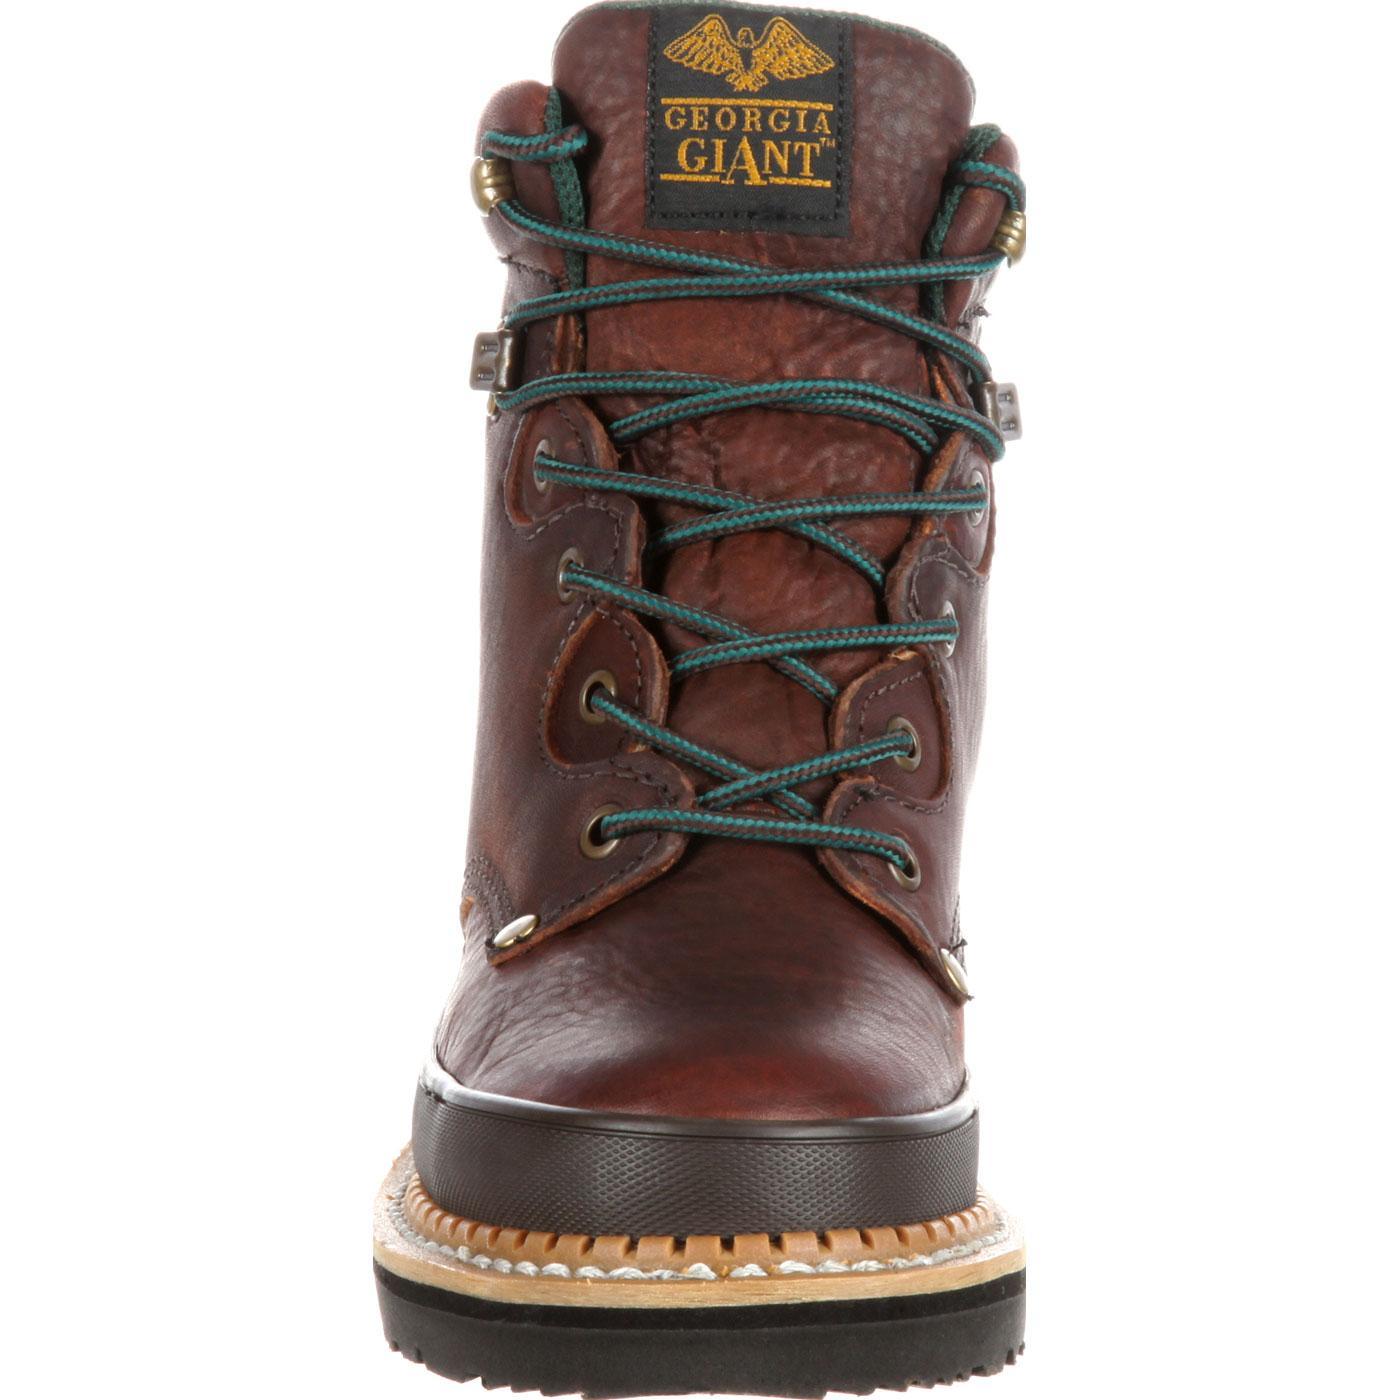 Georgia Giant Women s Steel Toe Work Boots - Style  G3374 9704d1a9b7